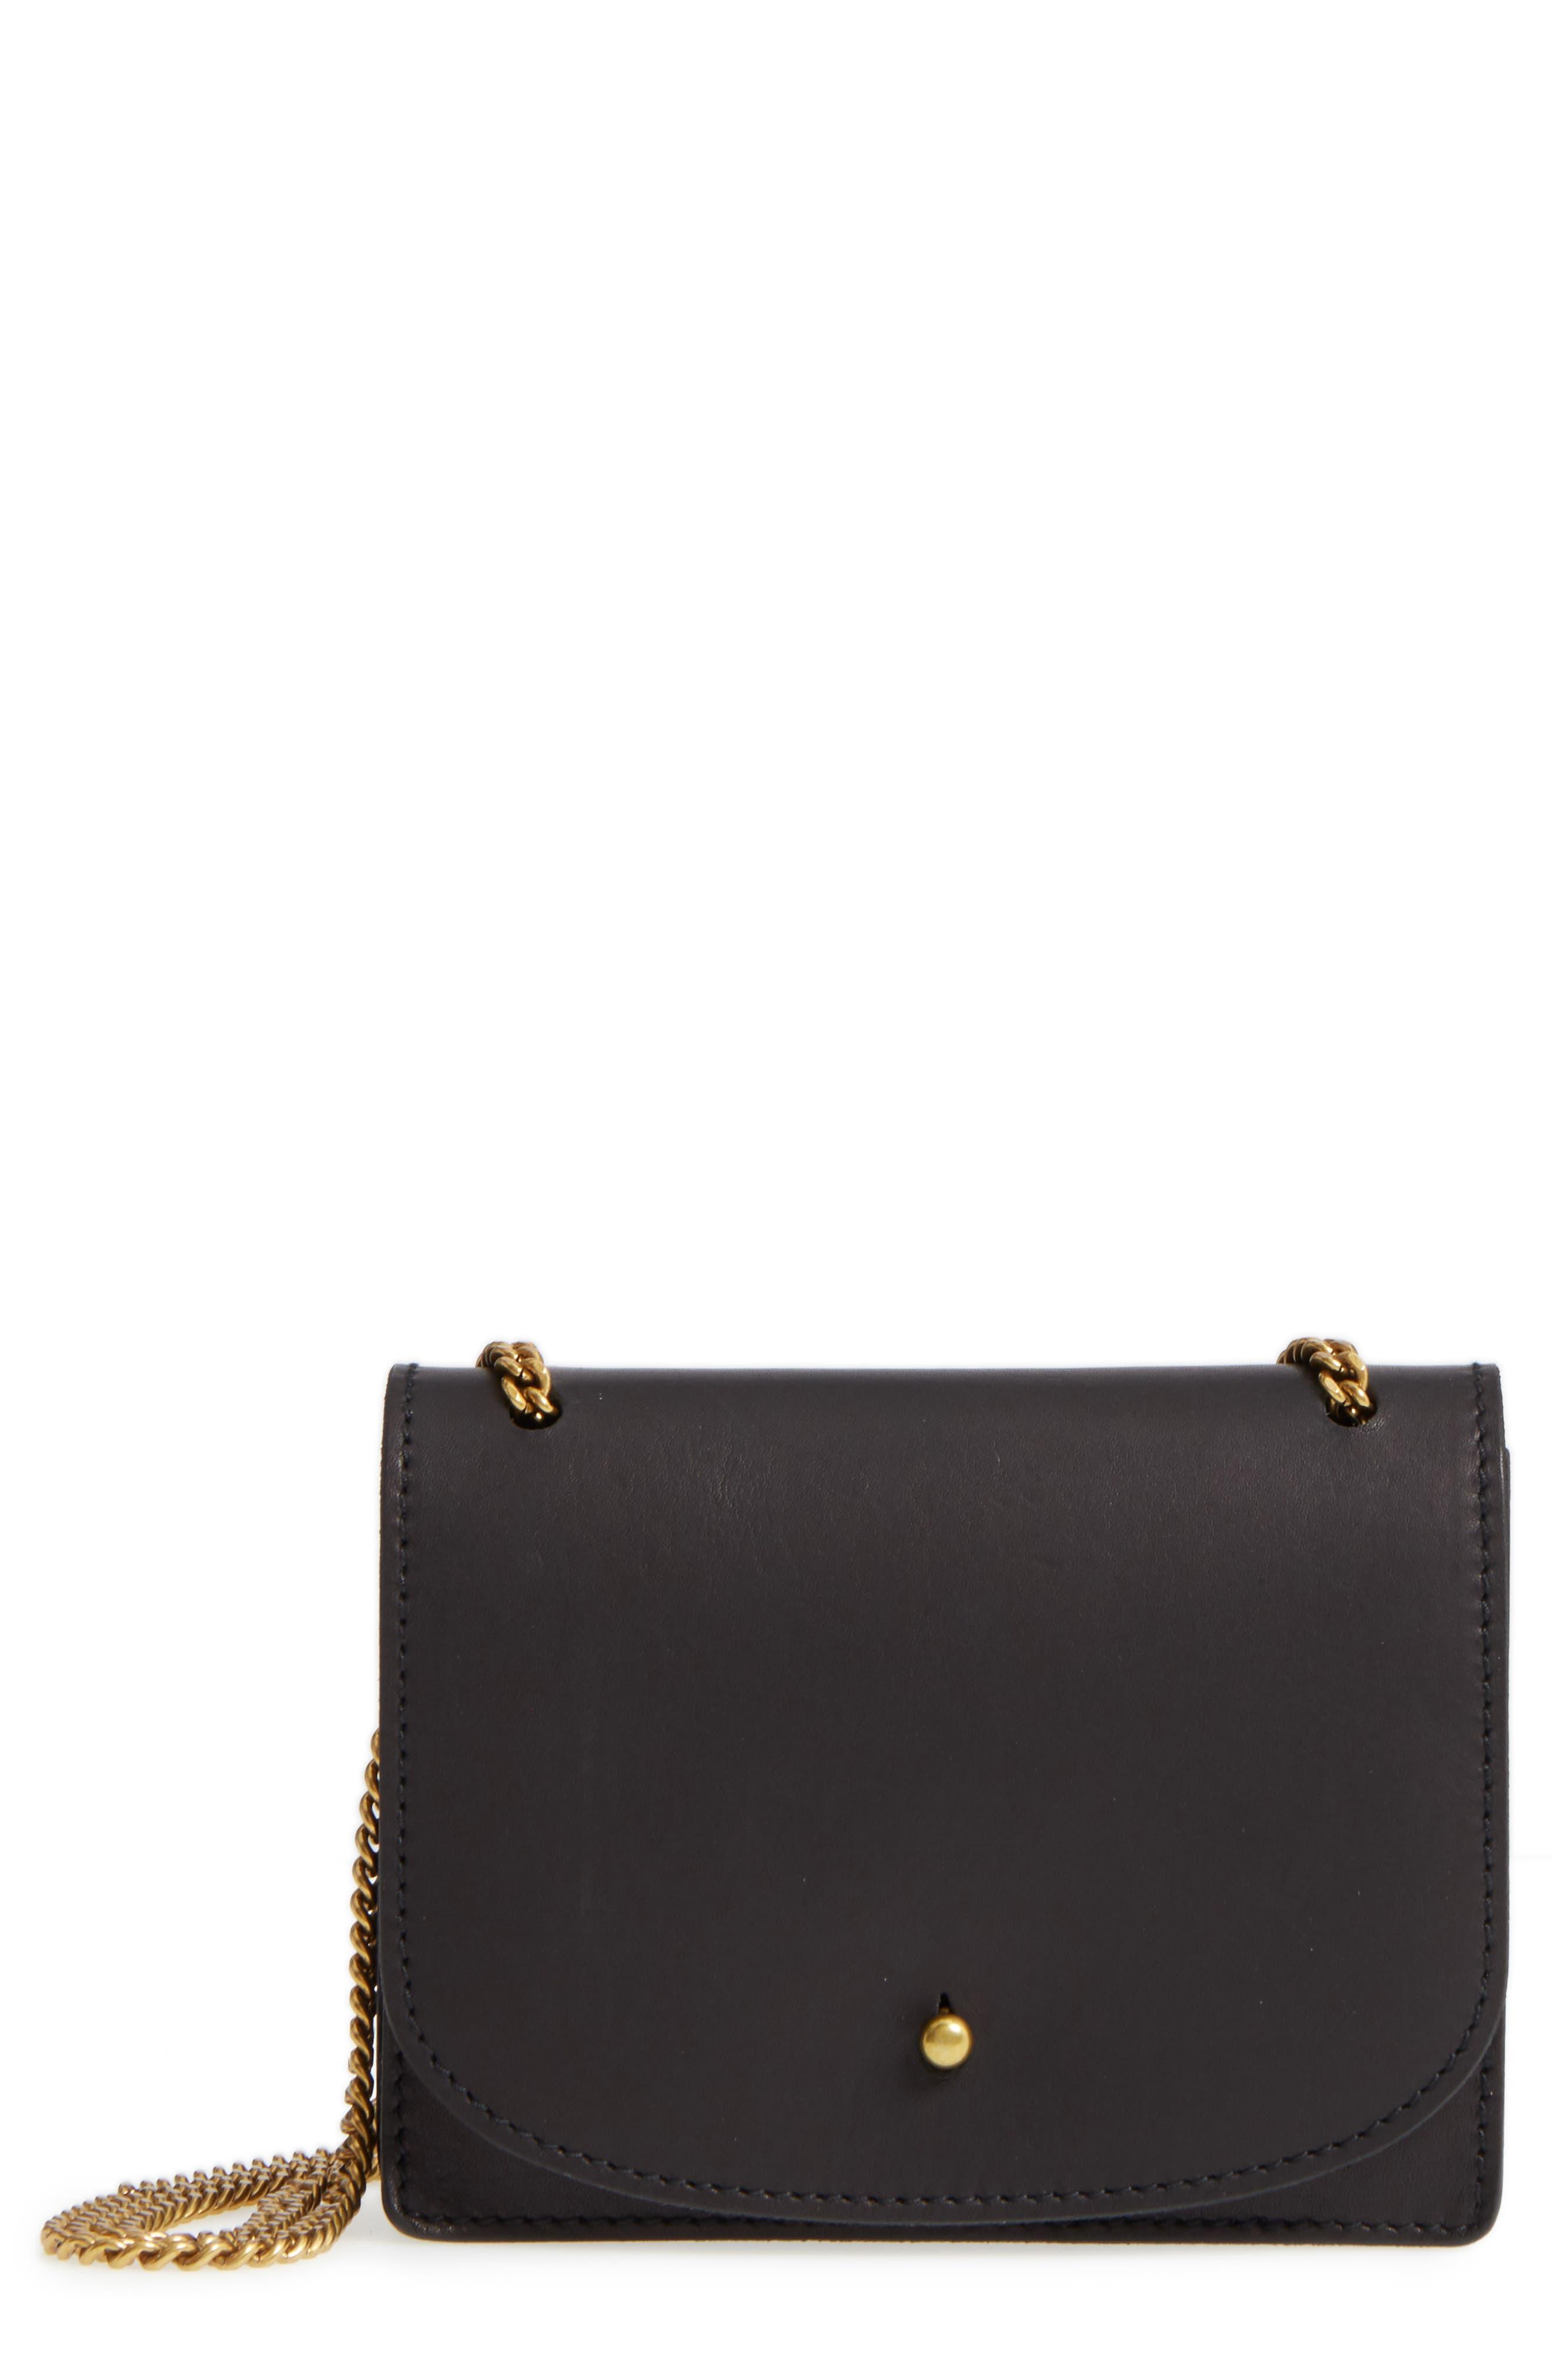 Madewell Chain Leather Crossbody Bag